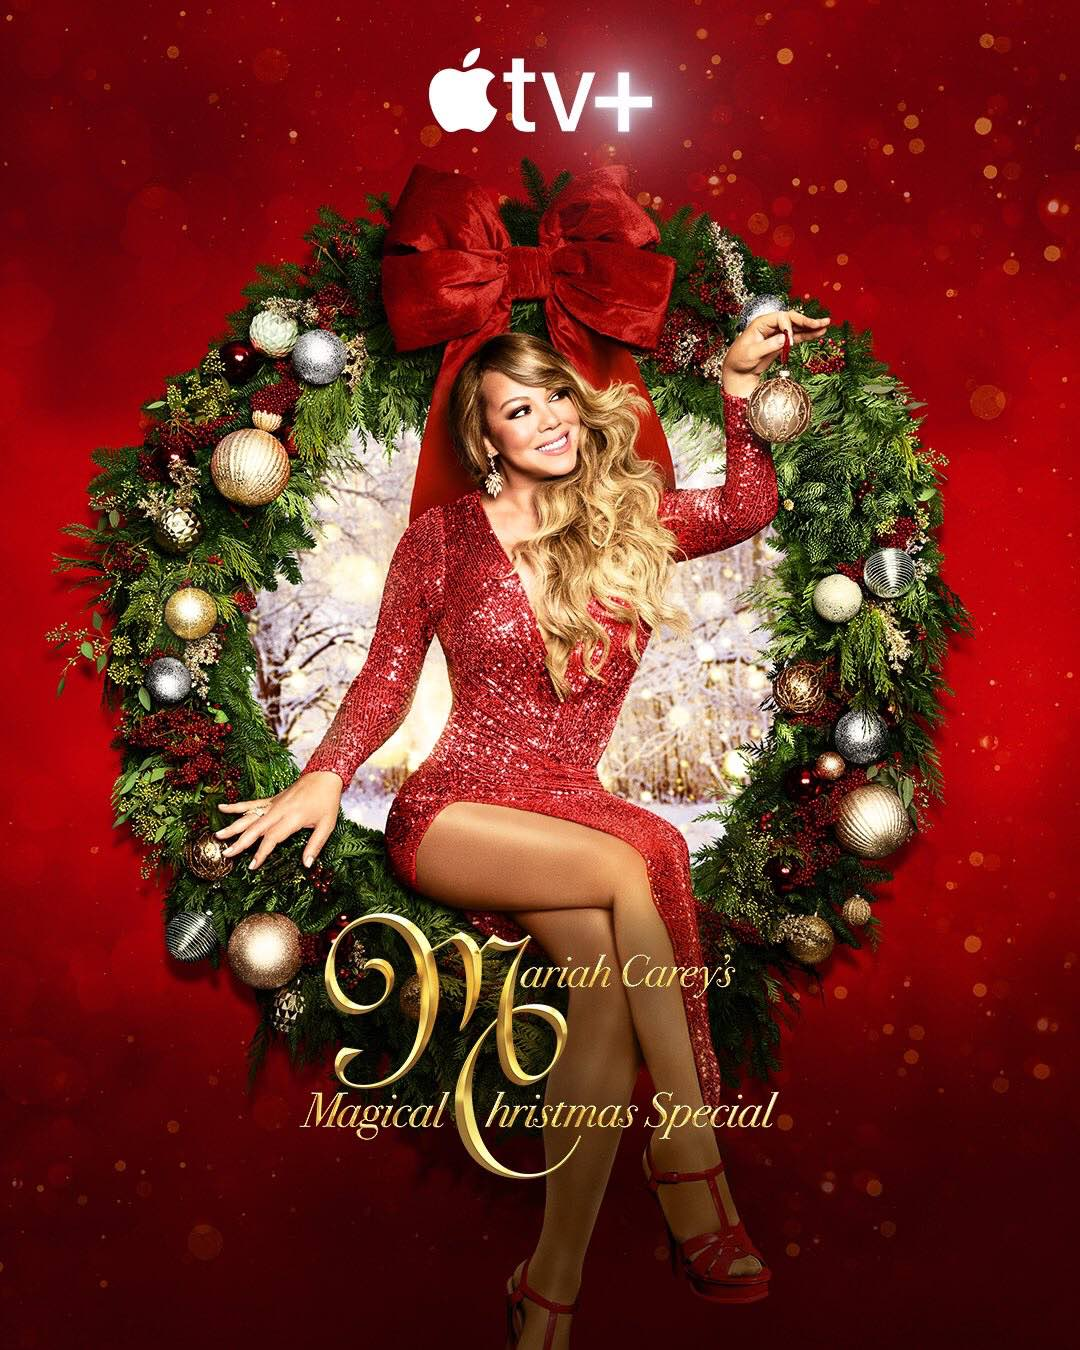 Mariah Carey - Christmas - AppleTV+